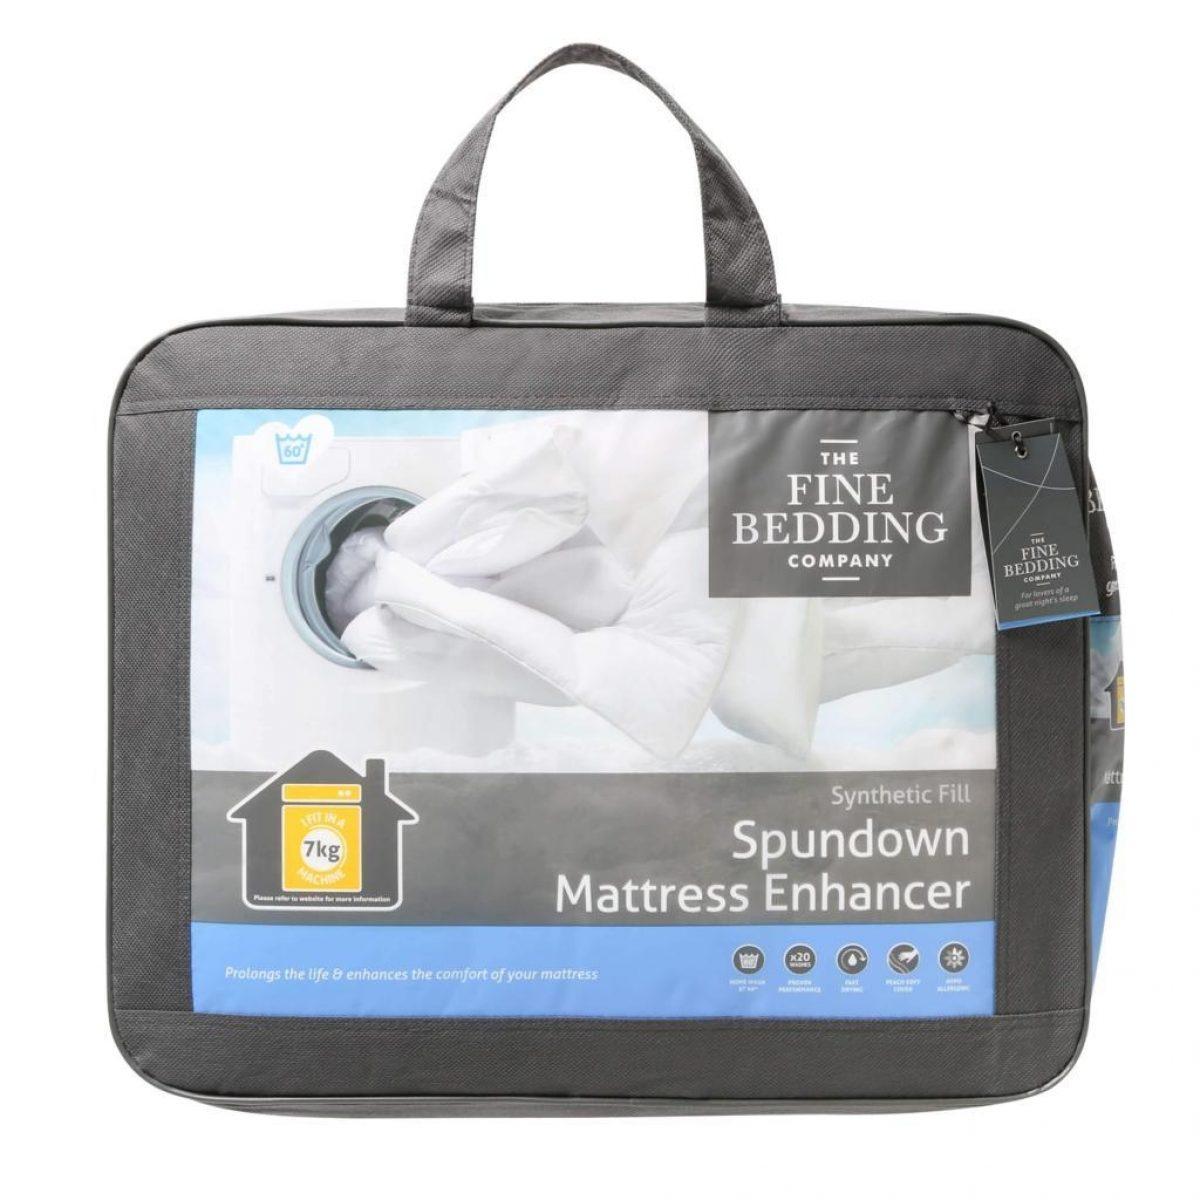 Fine Bedding Spundown Mattress Enhancer Packed 1024x1024